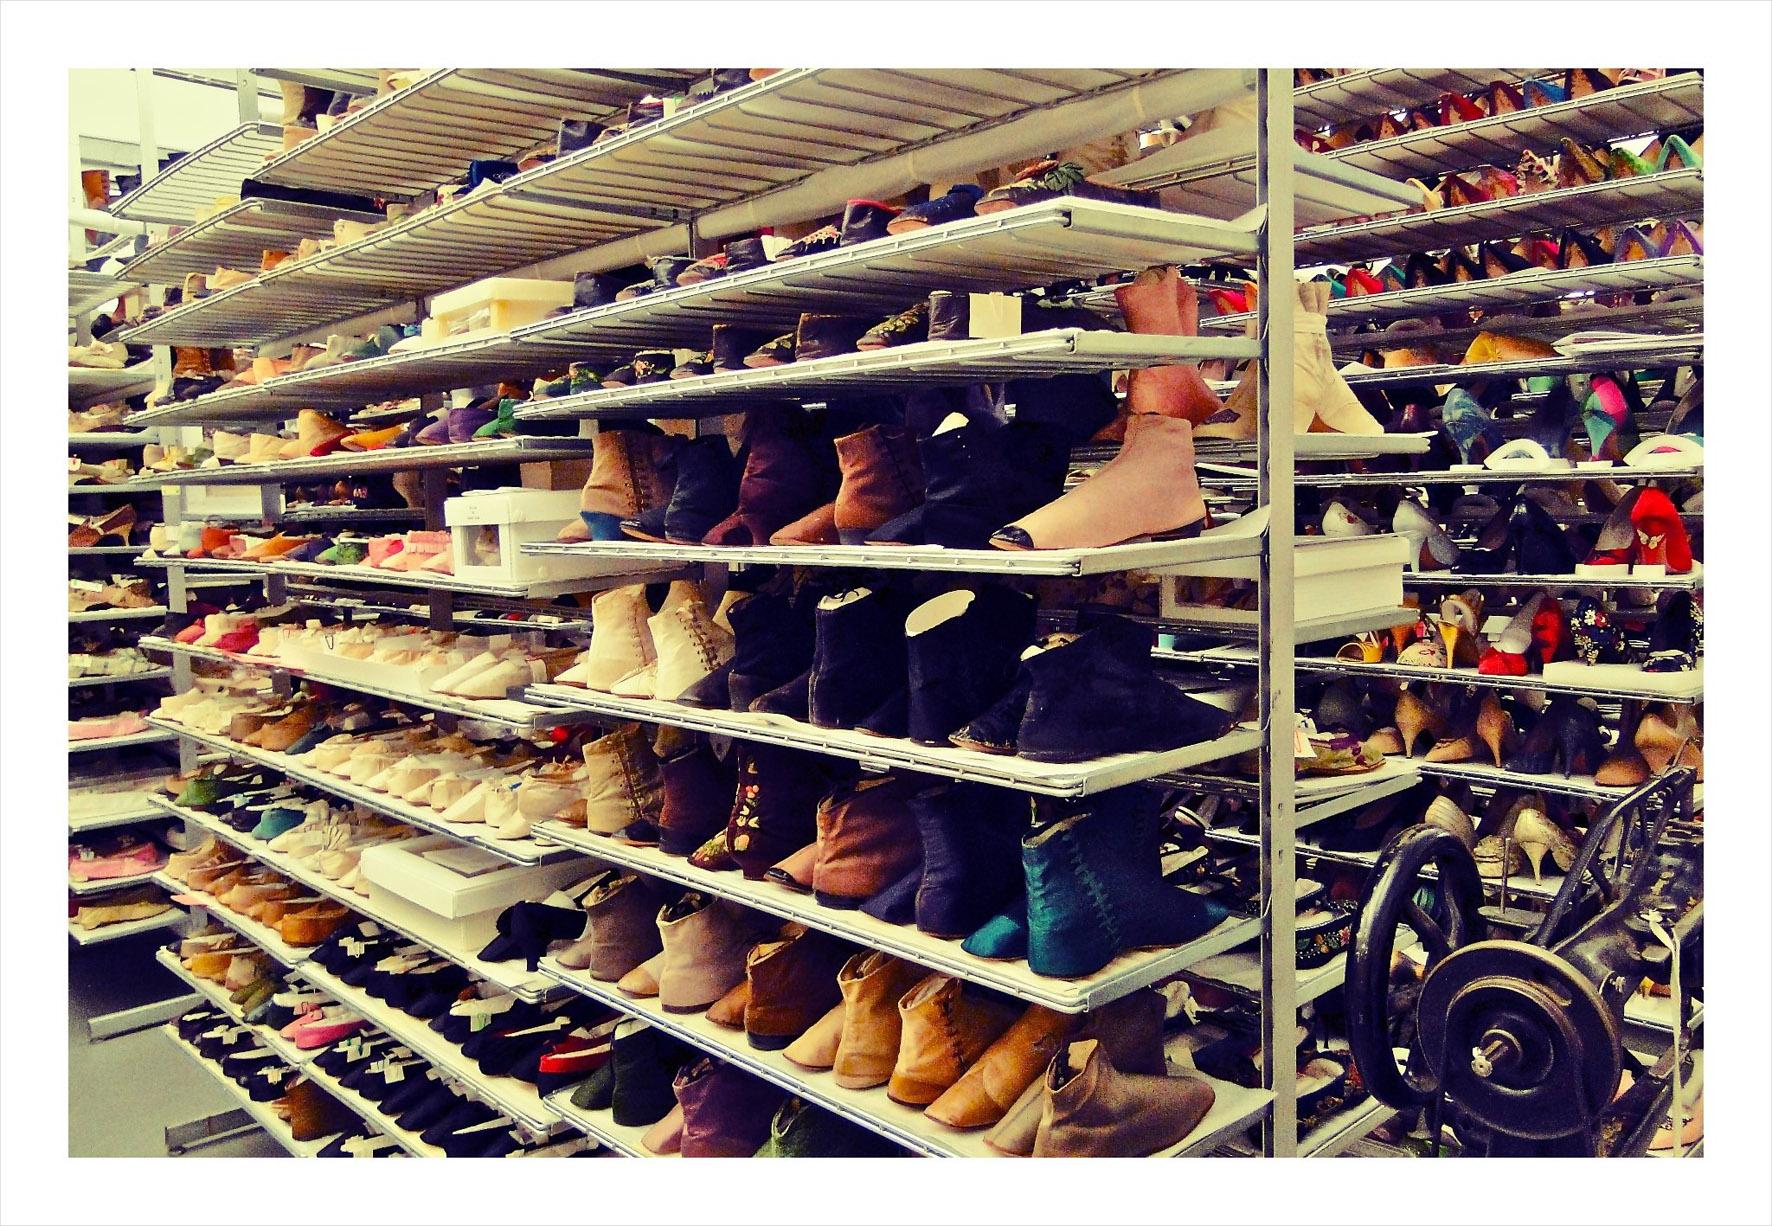 ACMI God Save My Shoes (Fashion on Film)